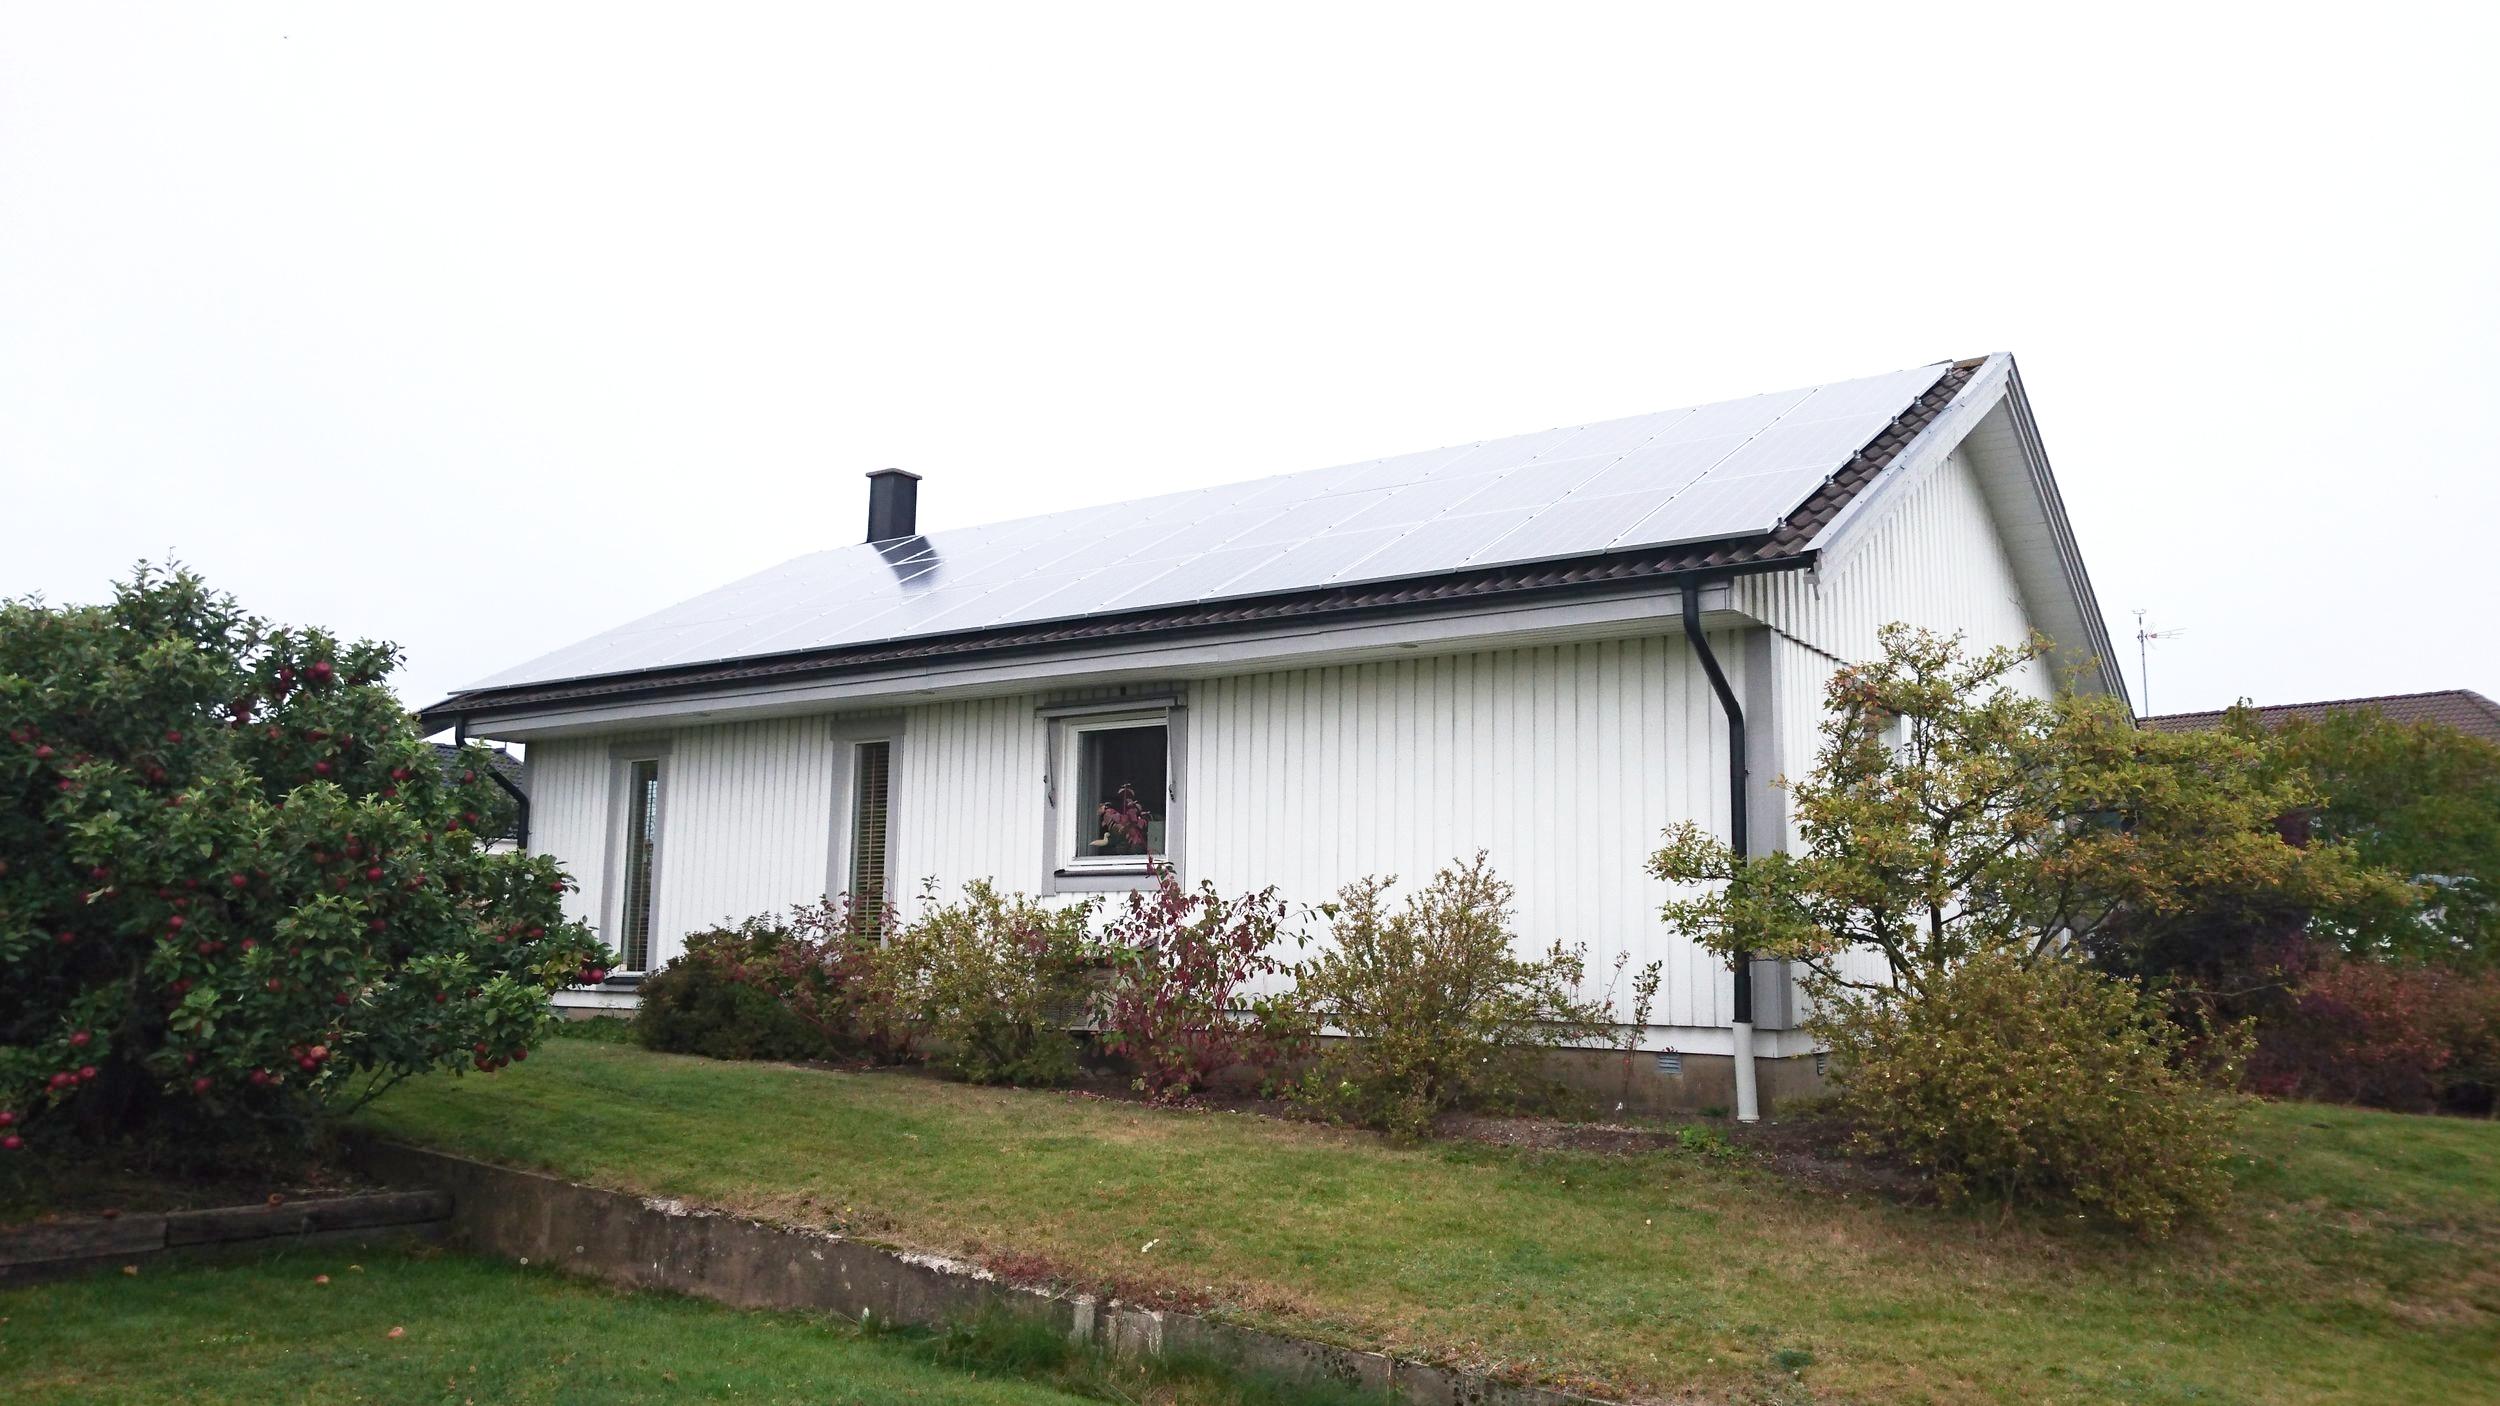 39 st 265W Hareon Solar  Investering 159 000 kr, återbetalningstid 8 år  Energiproduktion 11 100 kWh/år